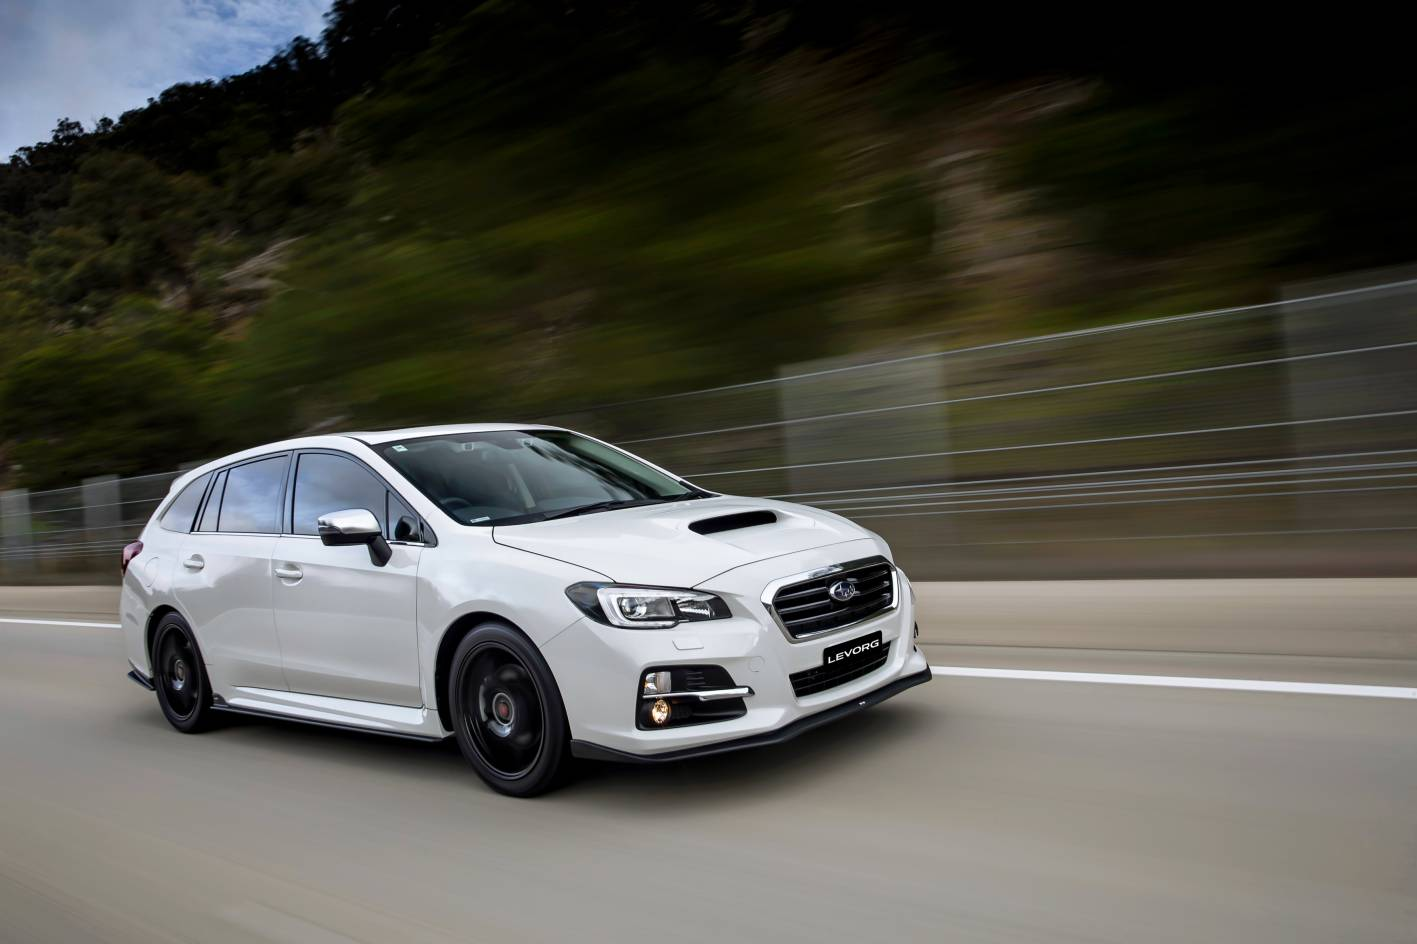 Subaru Wrx Sti Impreza 2017 >> 2017 Subaru Levorg wagon launches in Australia